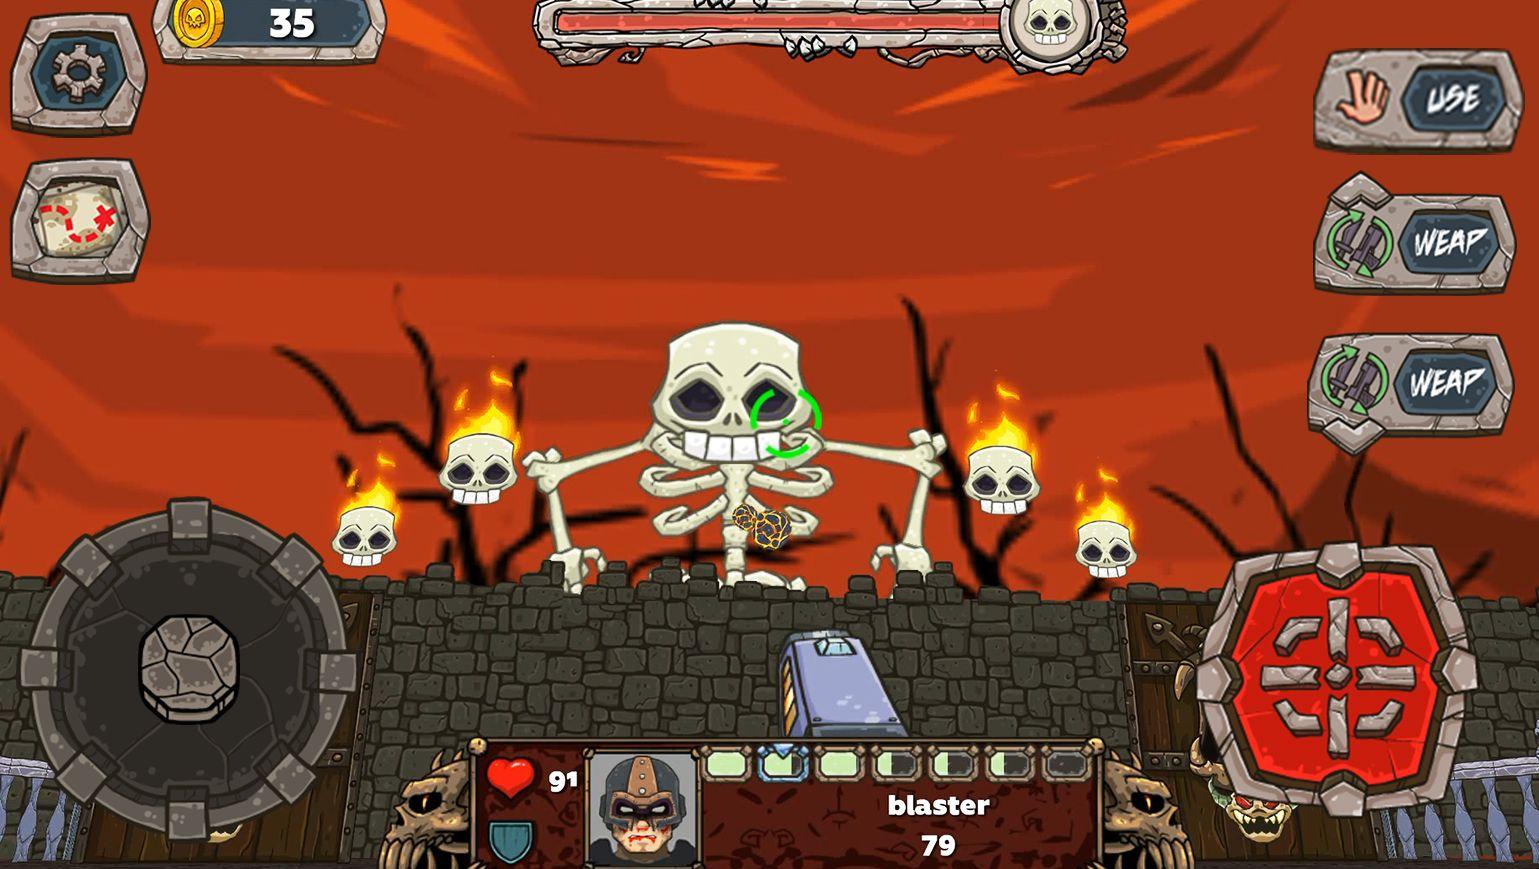 Demon Blast - 2.5d game retro fps скріншот 1